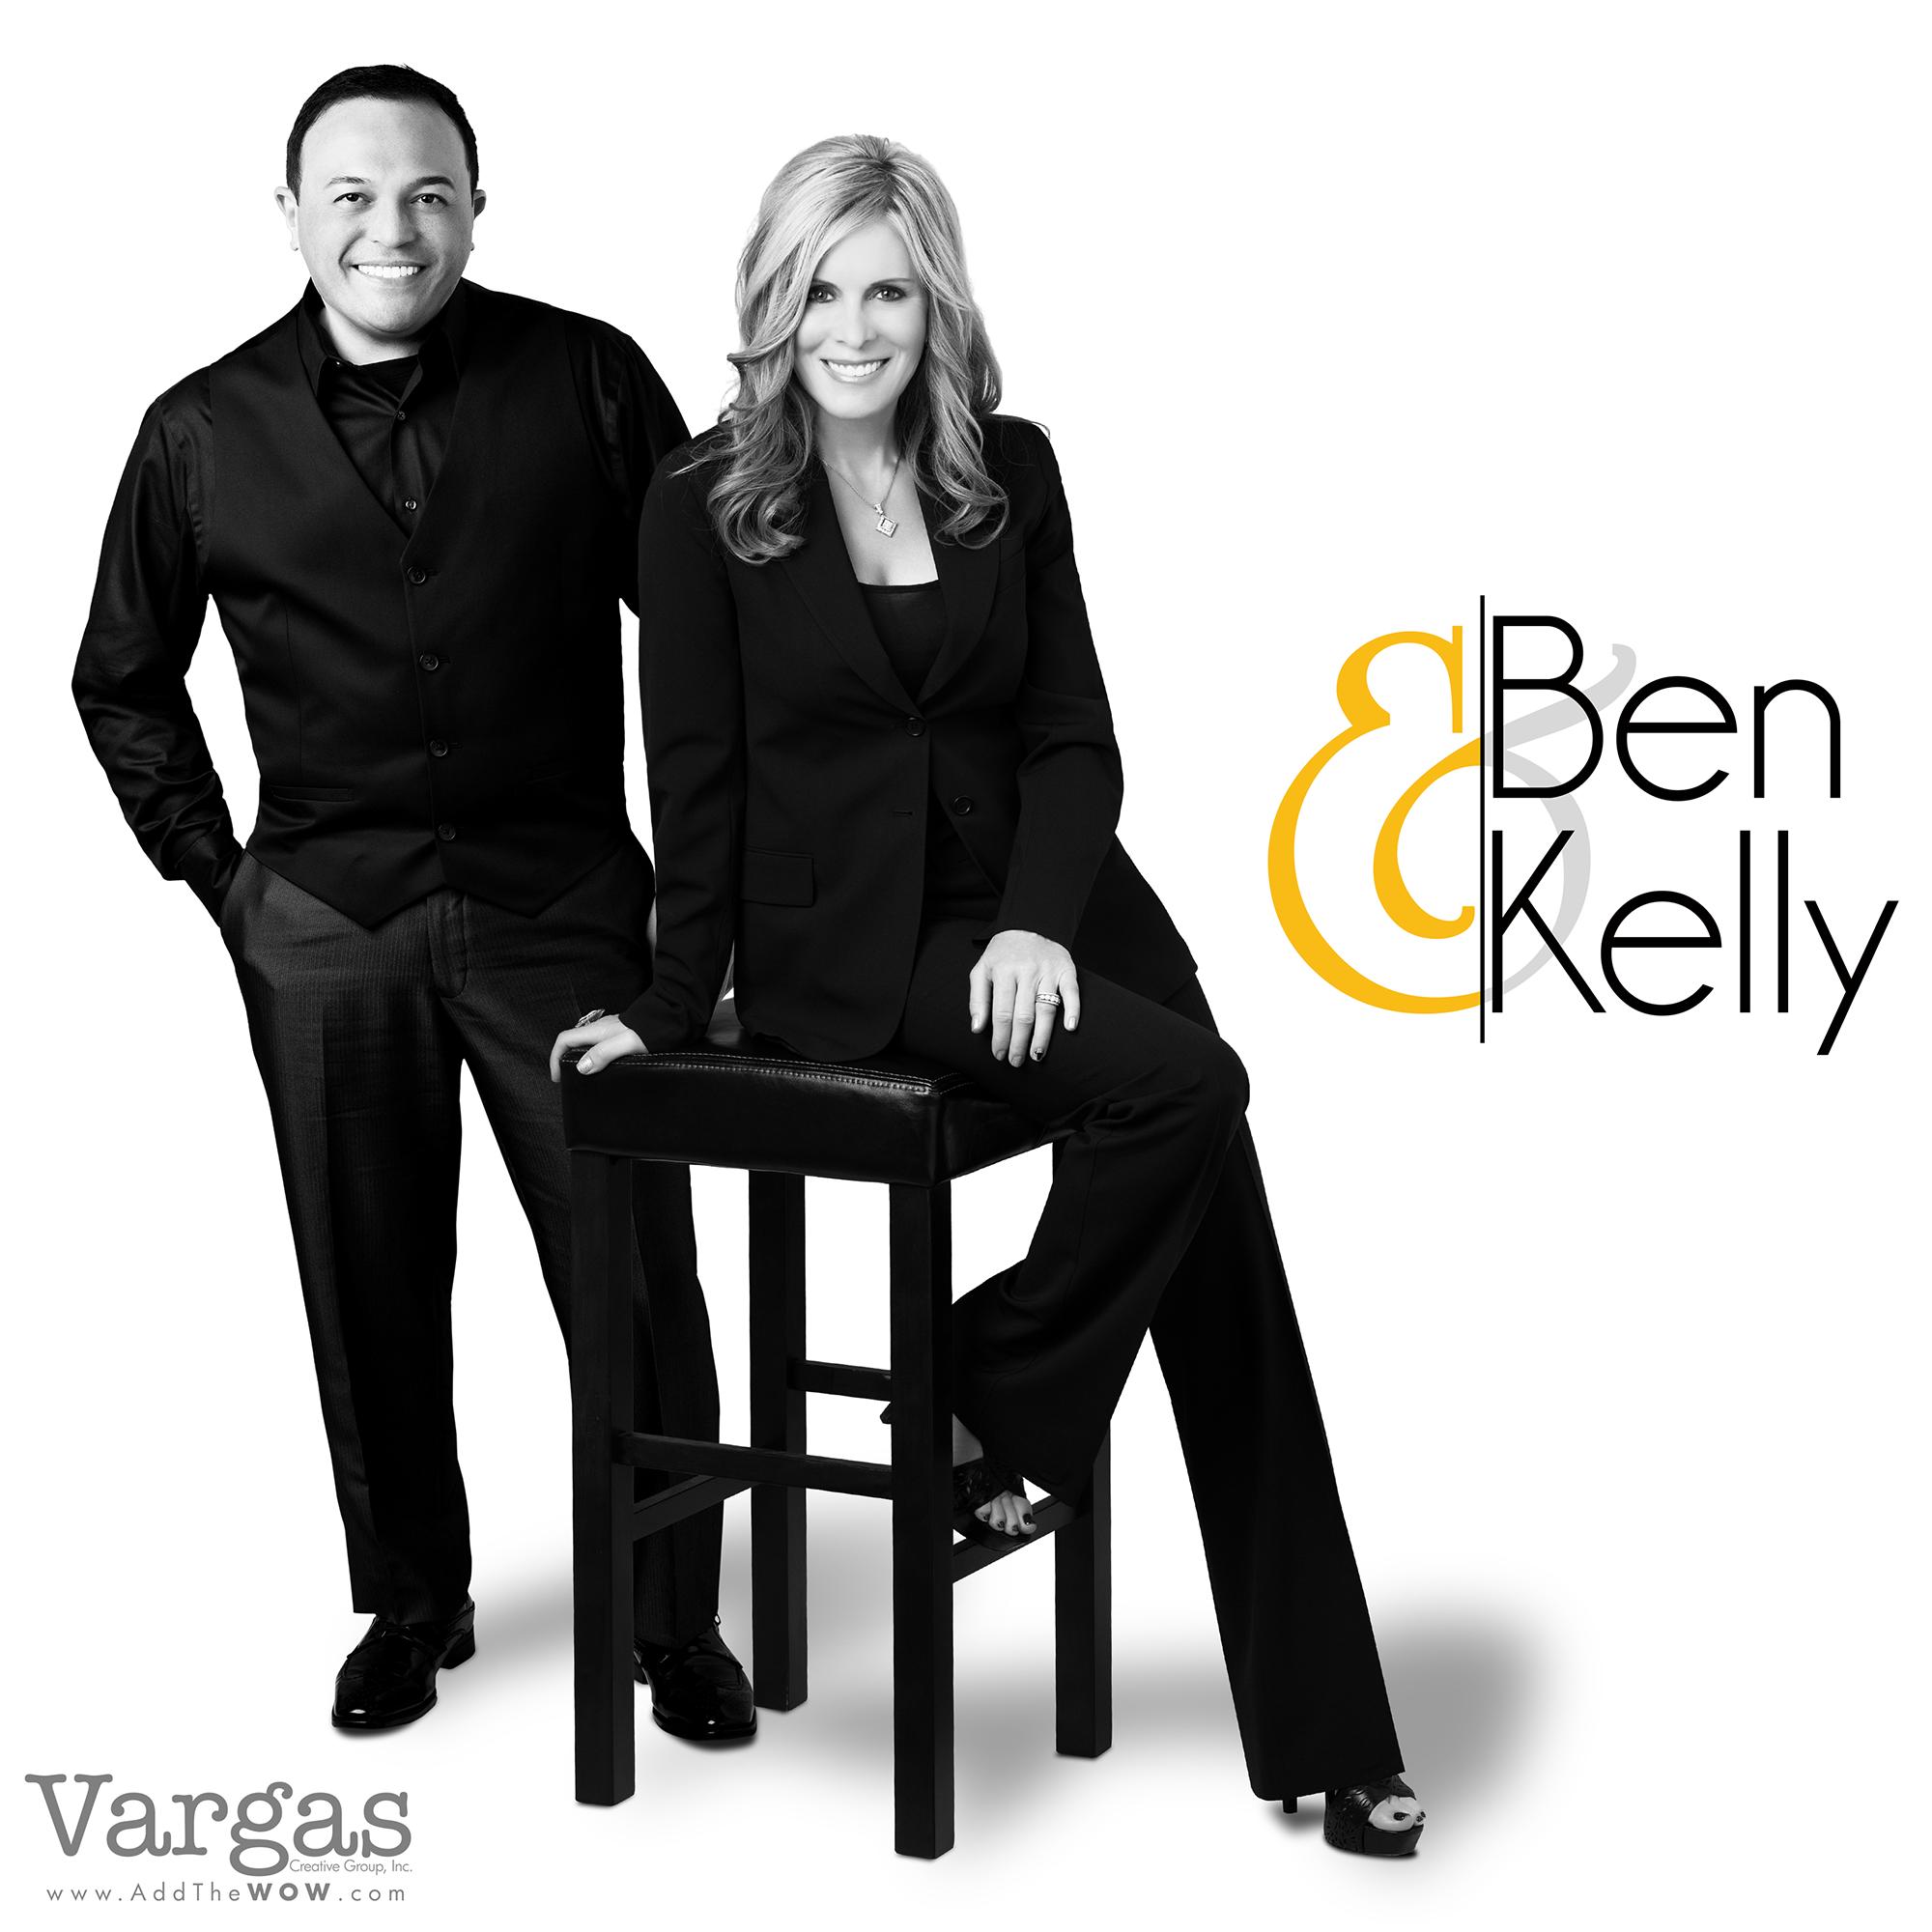 Ben-&-Kelly-Team-Photograph-w-logo.png